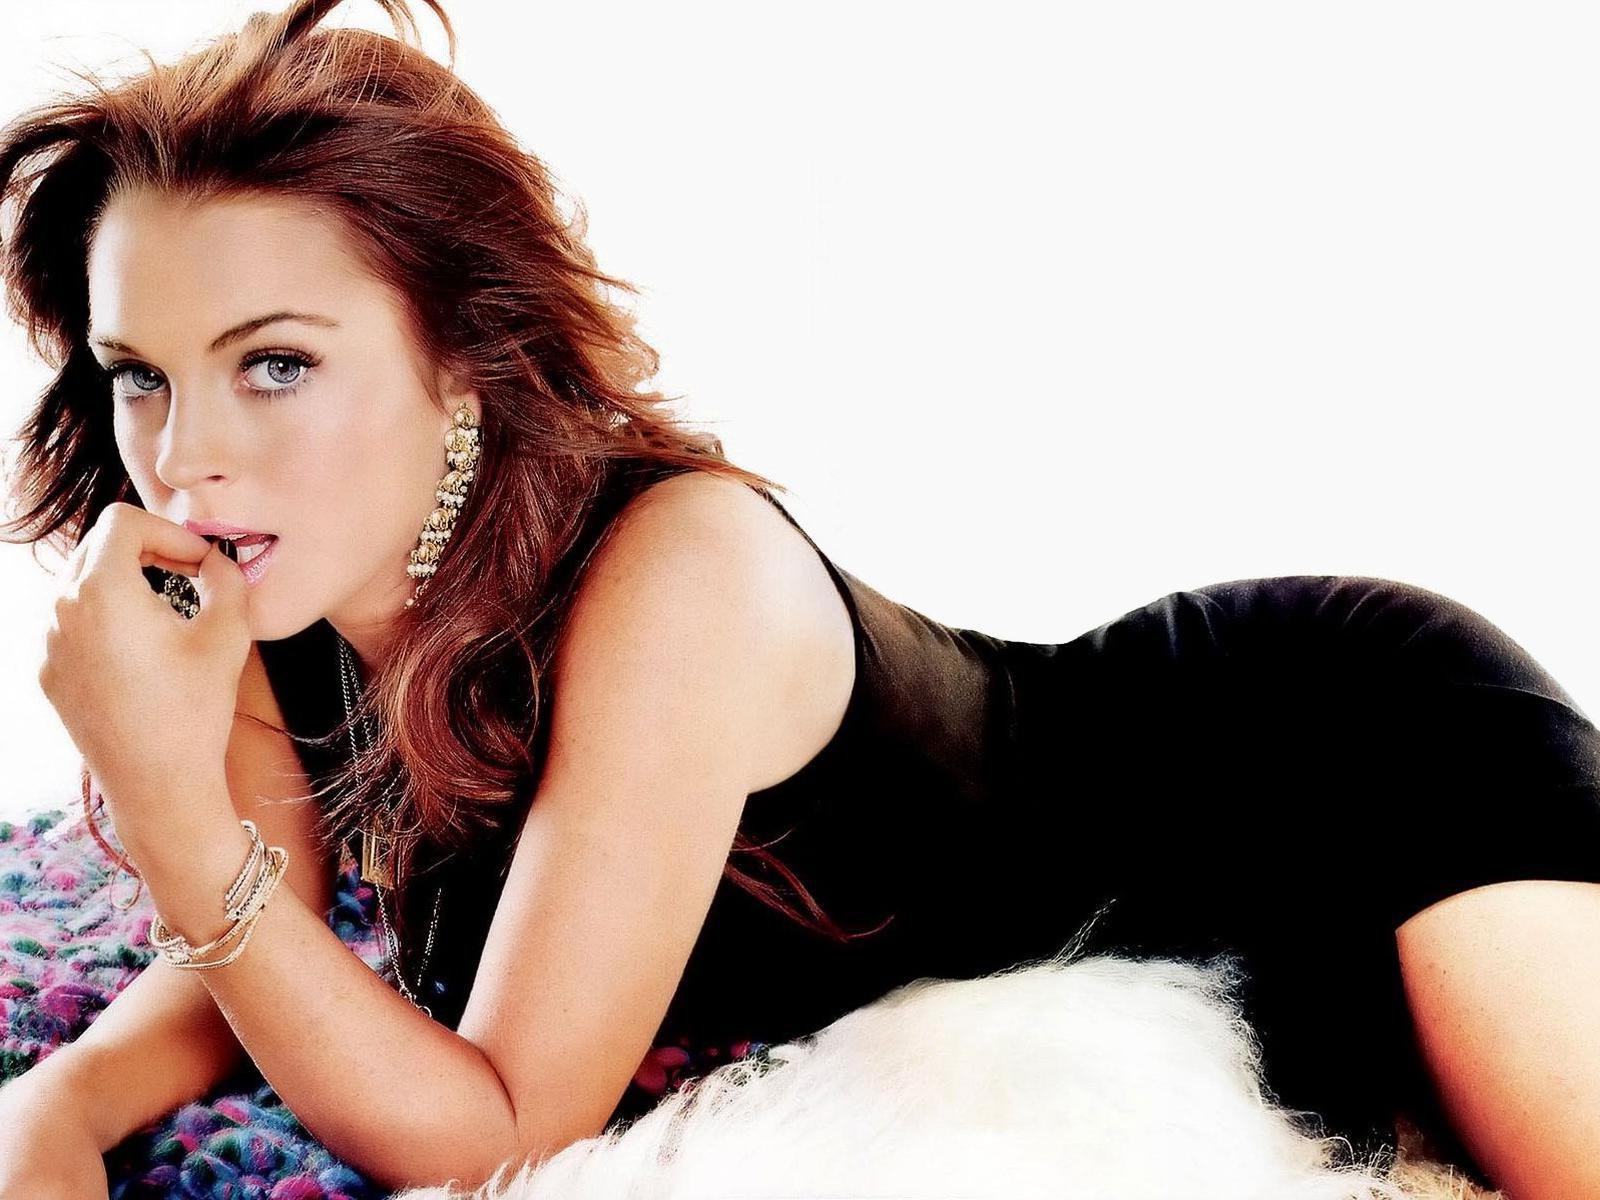 Lindsay Lohan hot wallpaper - Best HD Desktop Wallpaper